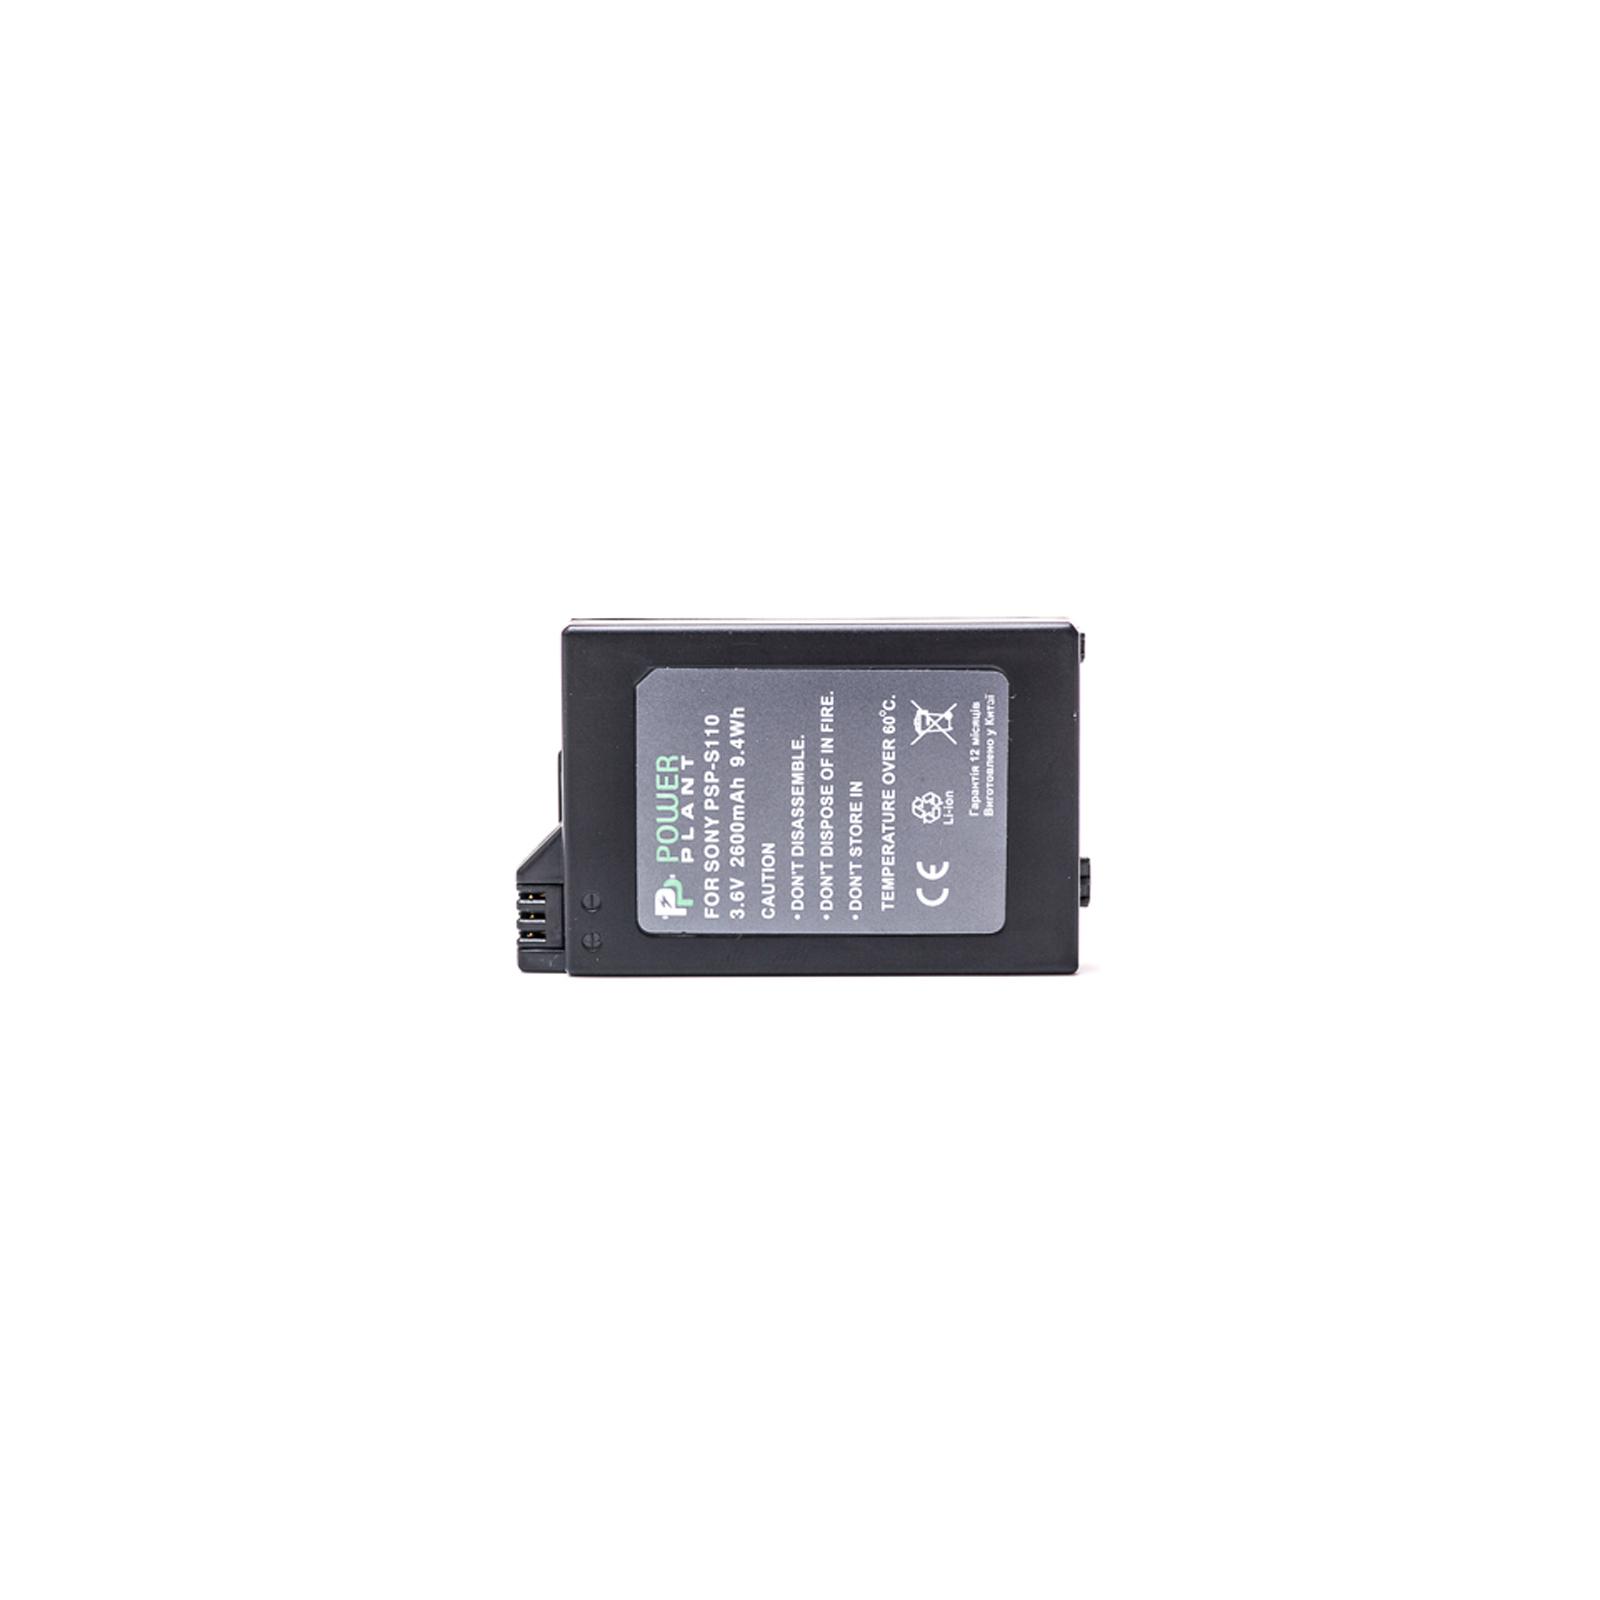 Аккумулятор к фото/видео PowerPlant Sony PSP-S110/2000/2600/S360 (DV00DV1300) изображение 2